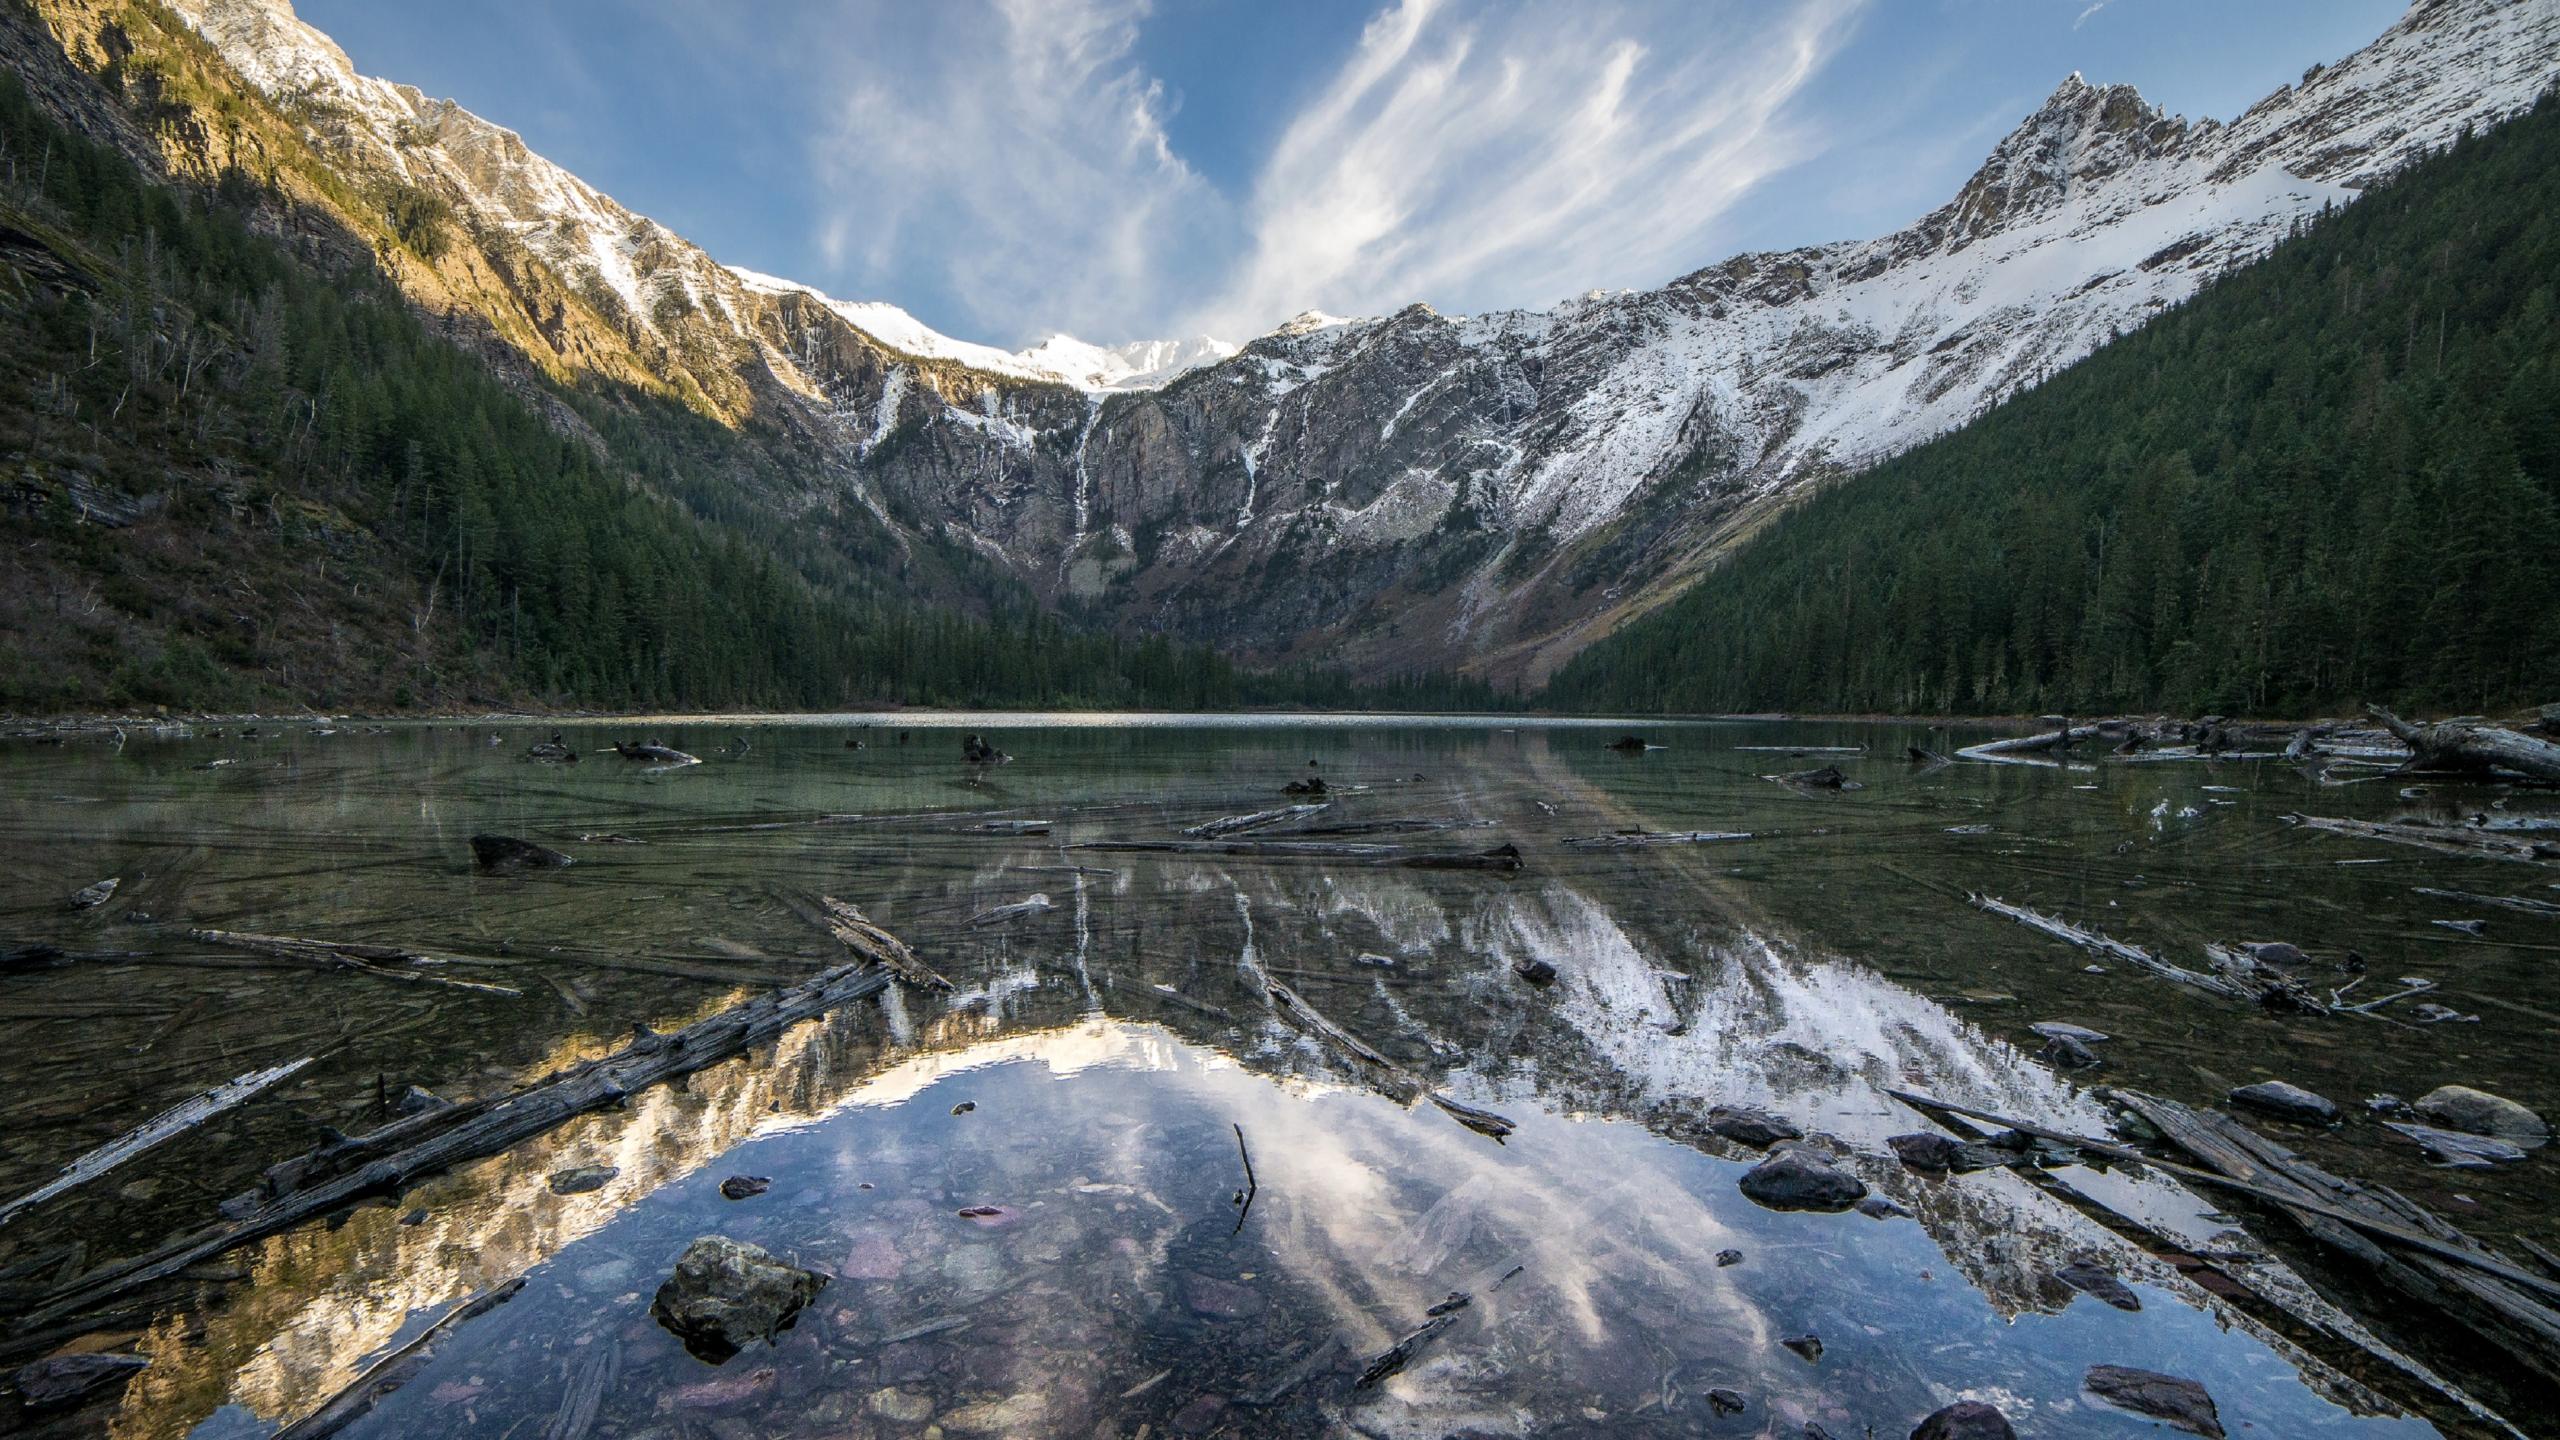 2560x1440 Montana United States Glacier National Park 1440p